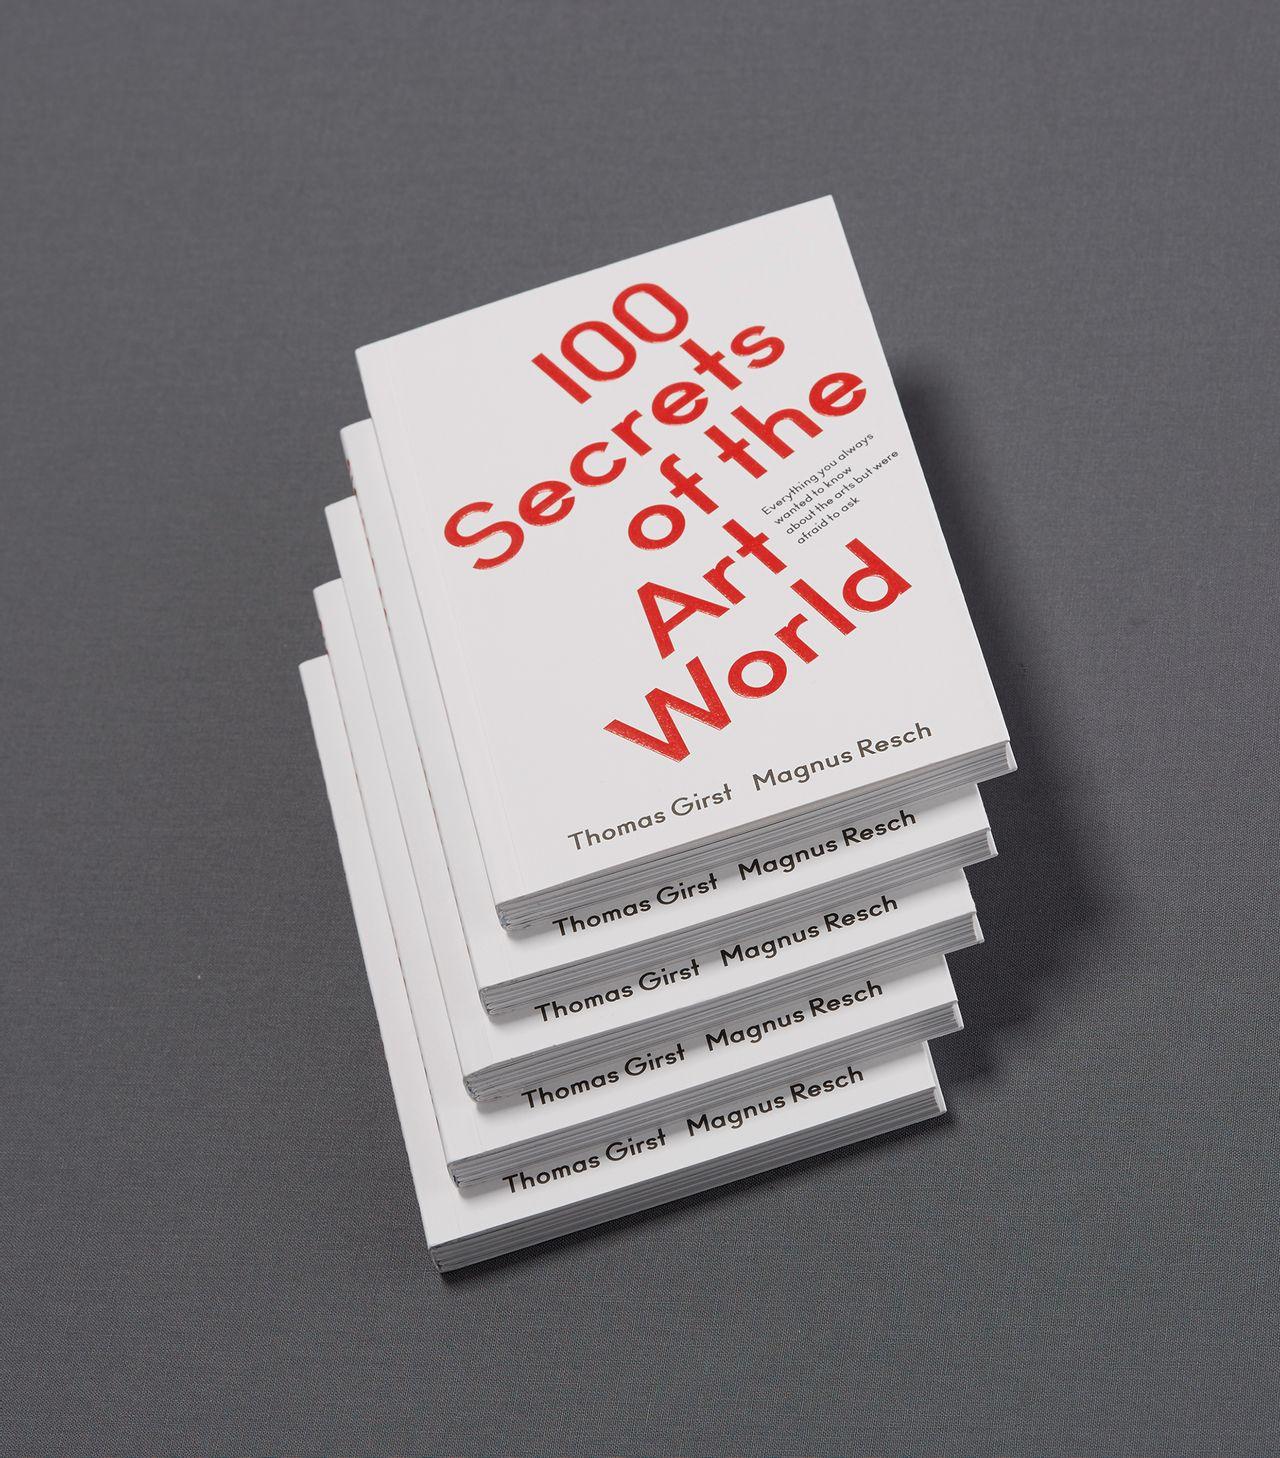 100 Secrets of the Art World, Studio Umlaut